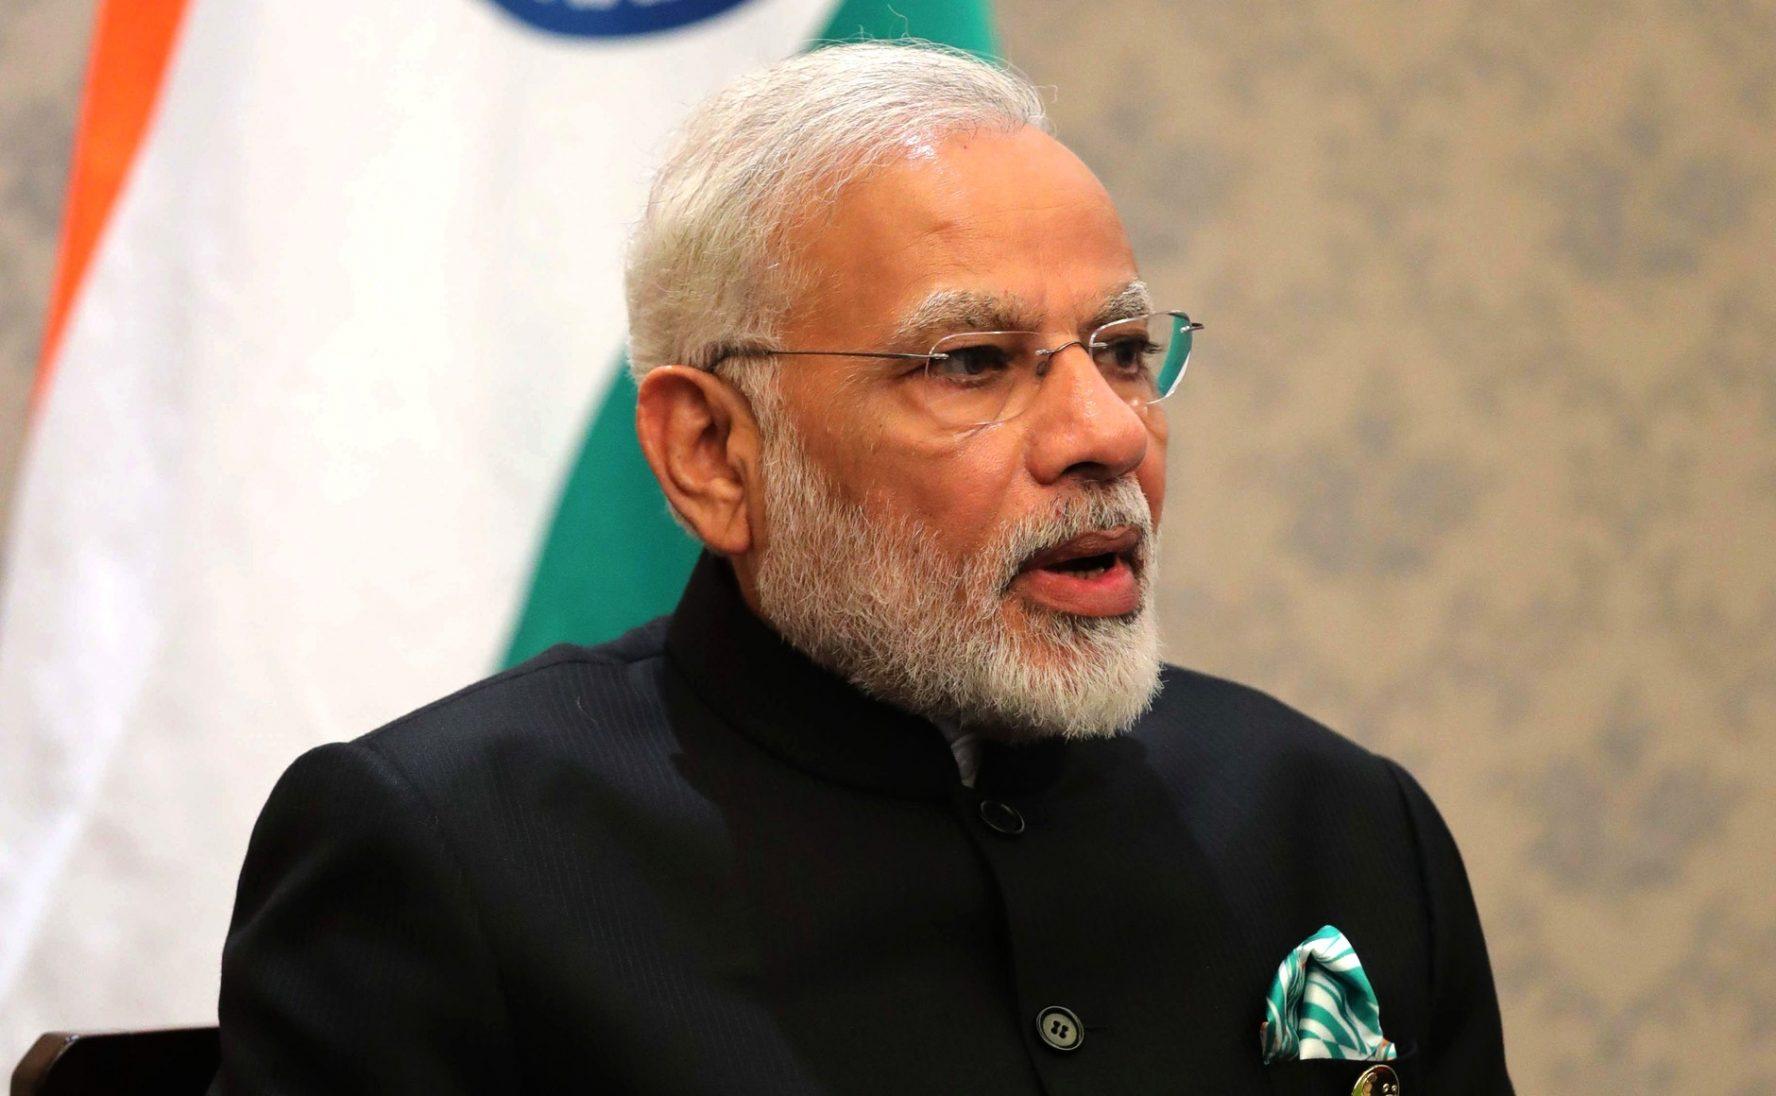 Indian PM Modi at the BRICS Summit. Photo by the Kremlin.